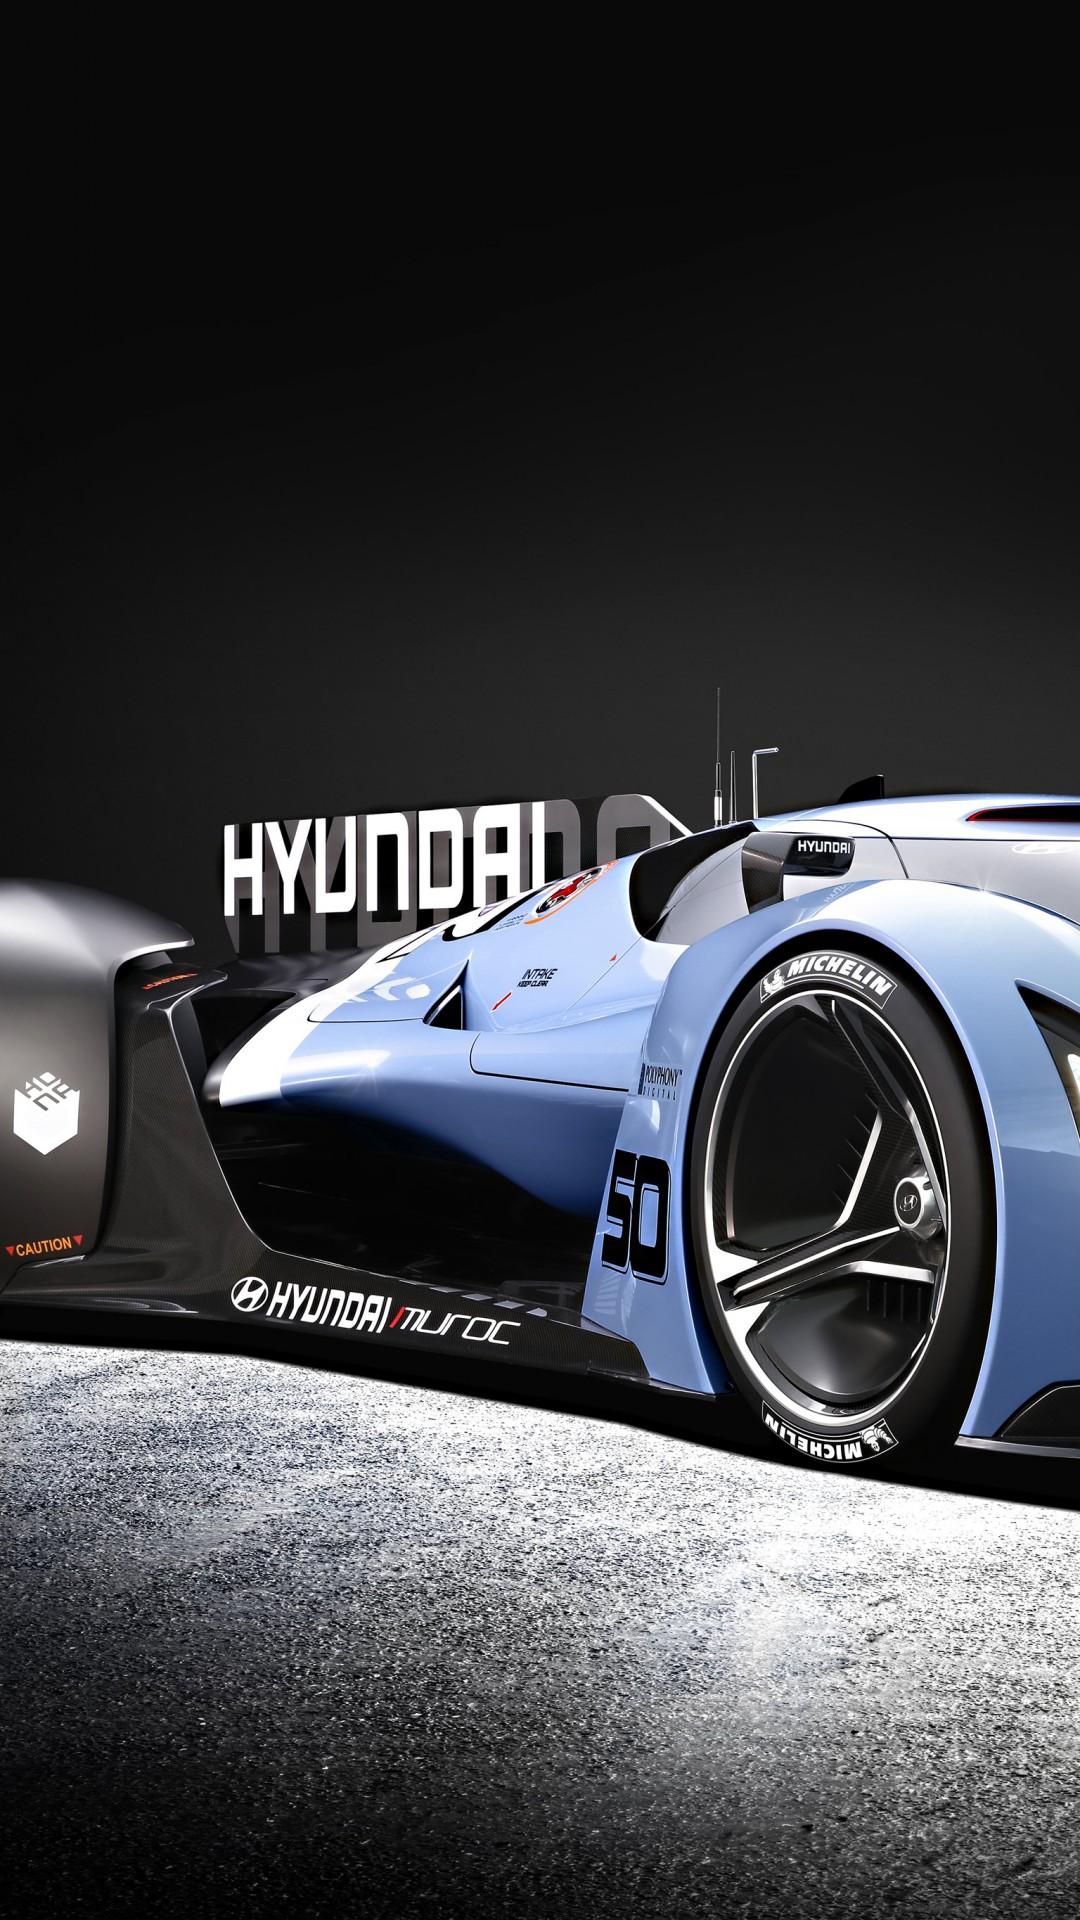 Wallpaper Hyundai N 2025 Vision Gran Turismo, Hyundai ...